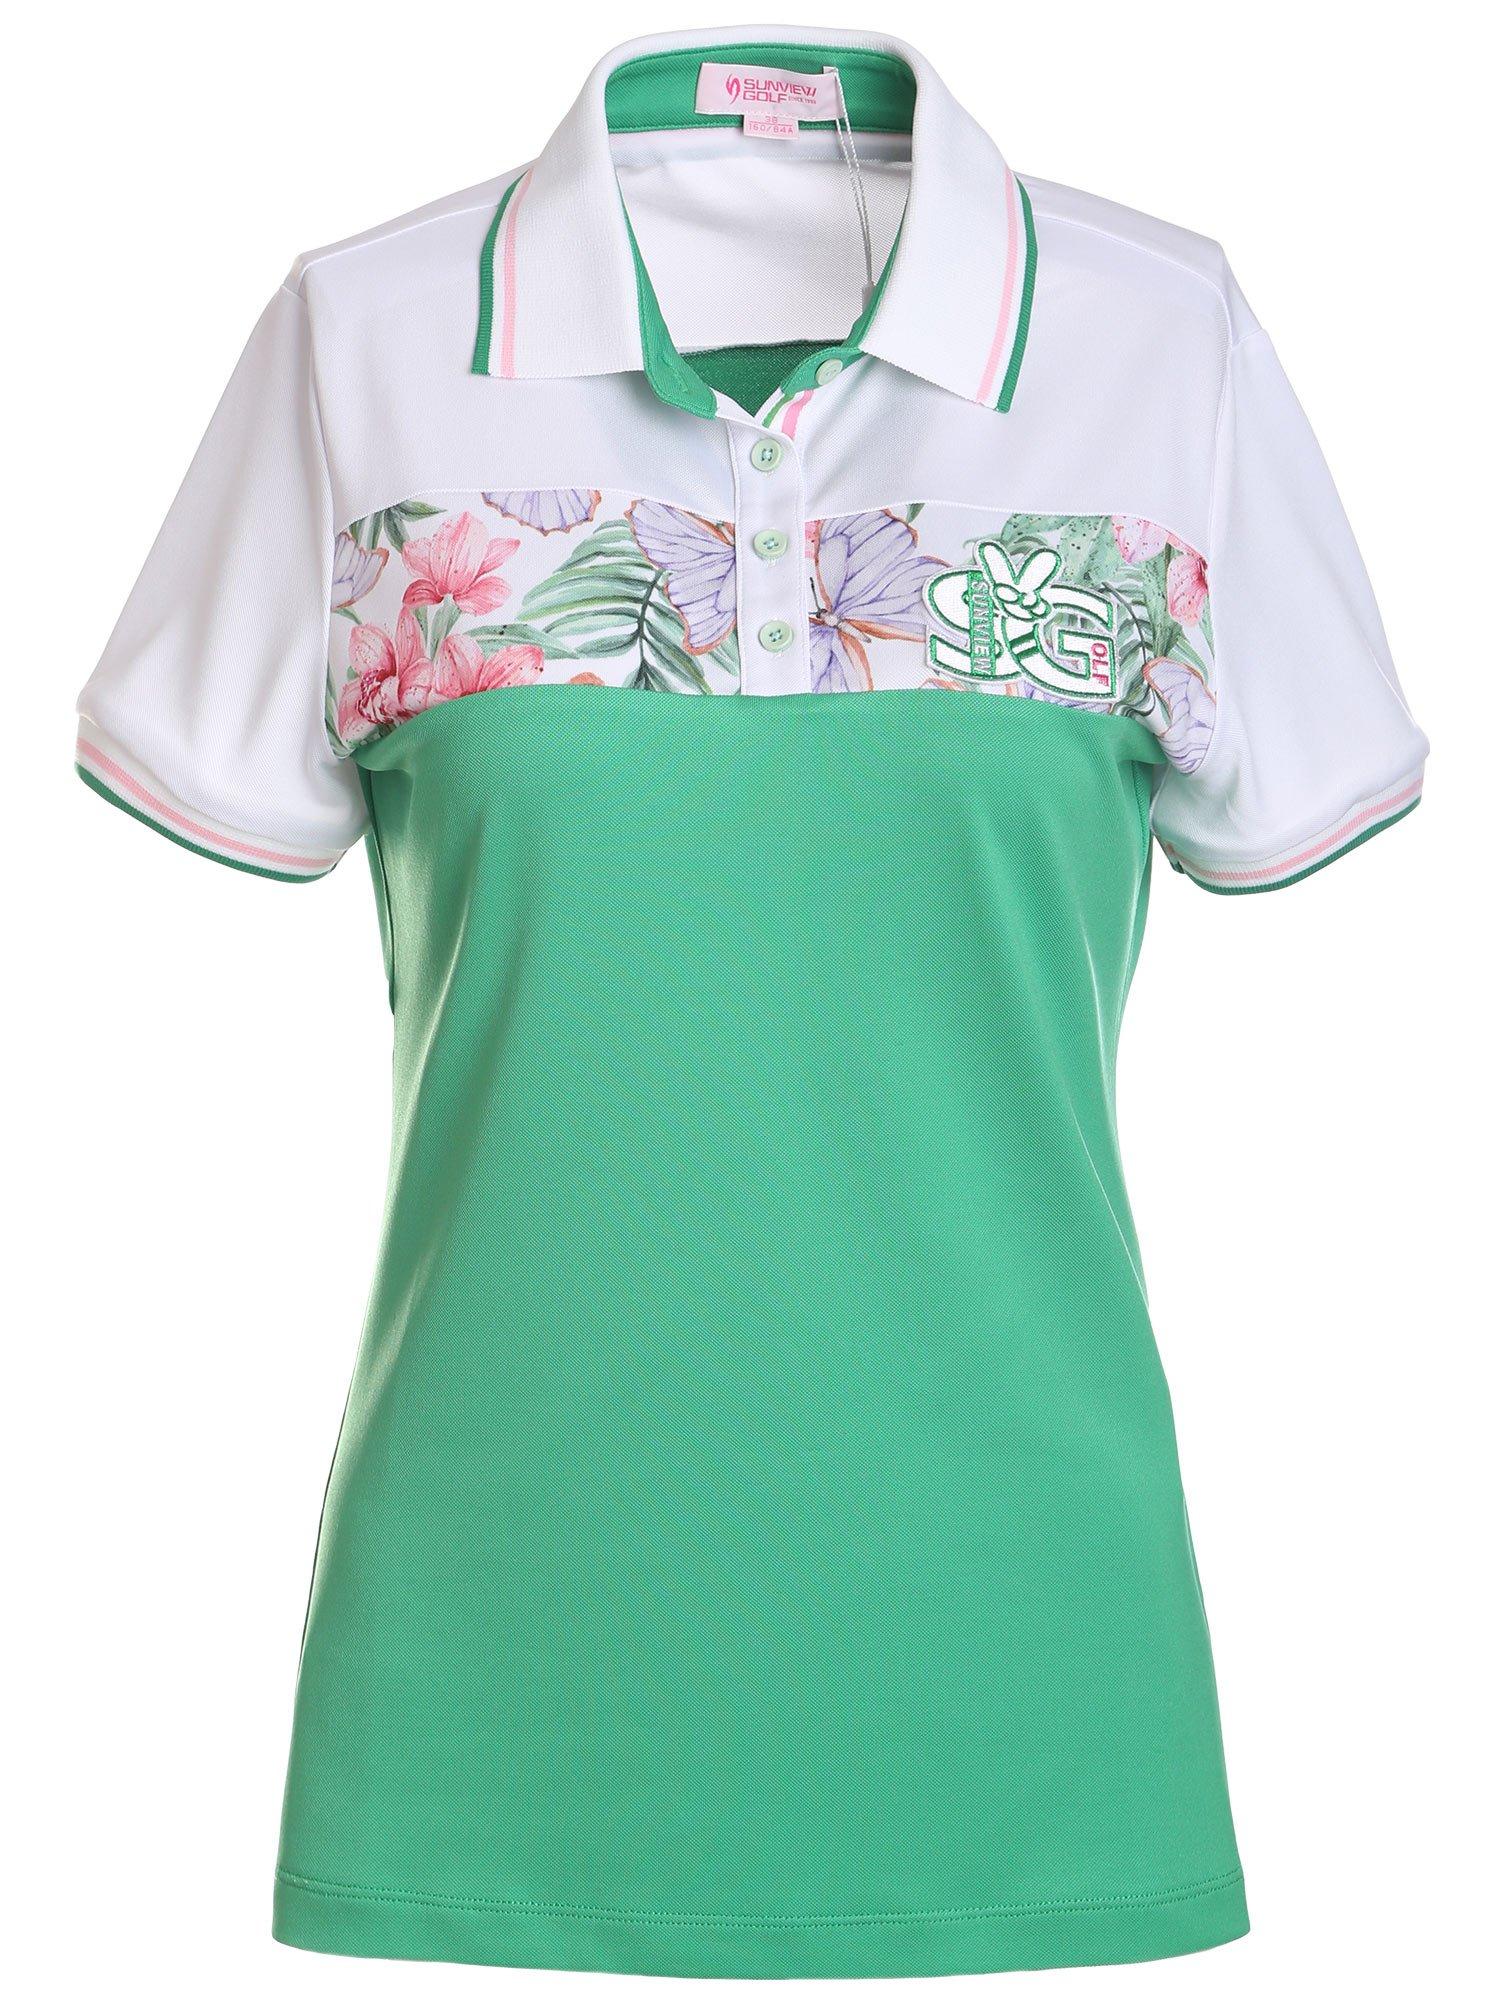 SunviewGolf Women's Floral Print Polo Golf Shirt Summer Short Sleeve Casual Shirt Top S